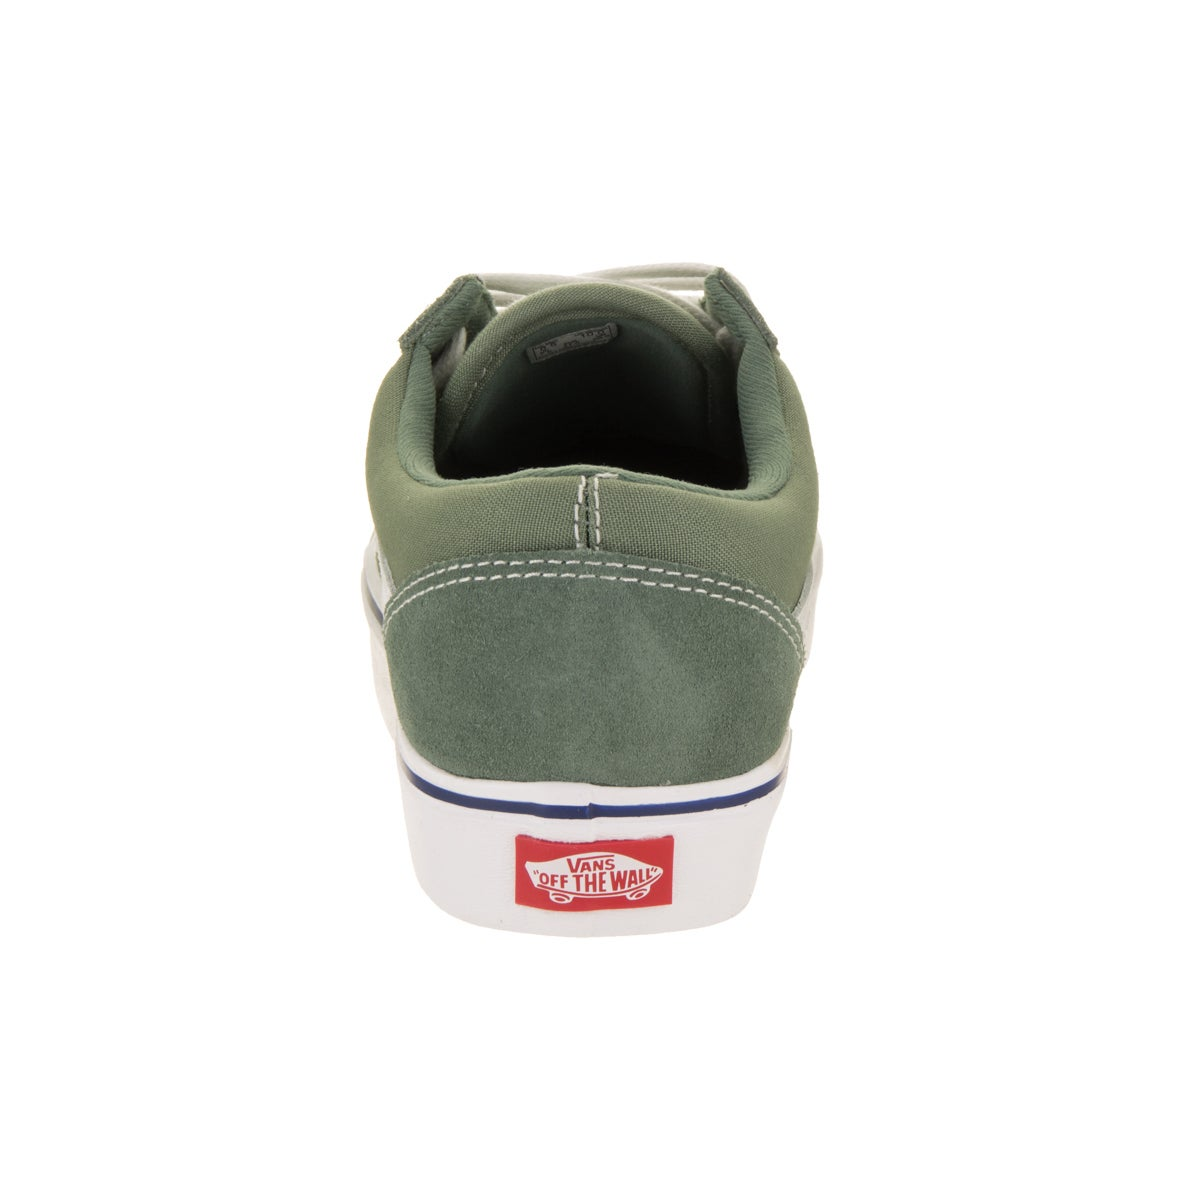 0cd3474d19 Shop Vans Unisex Old Skool Lite (Throwback) Skate Shoe - Ships To Canada -  Overstock - 16739630